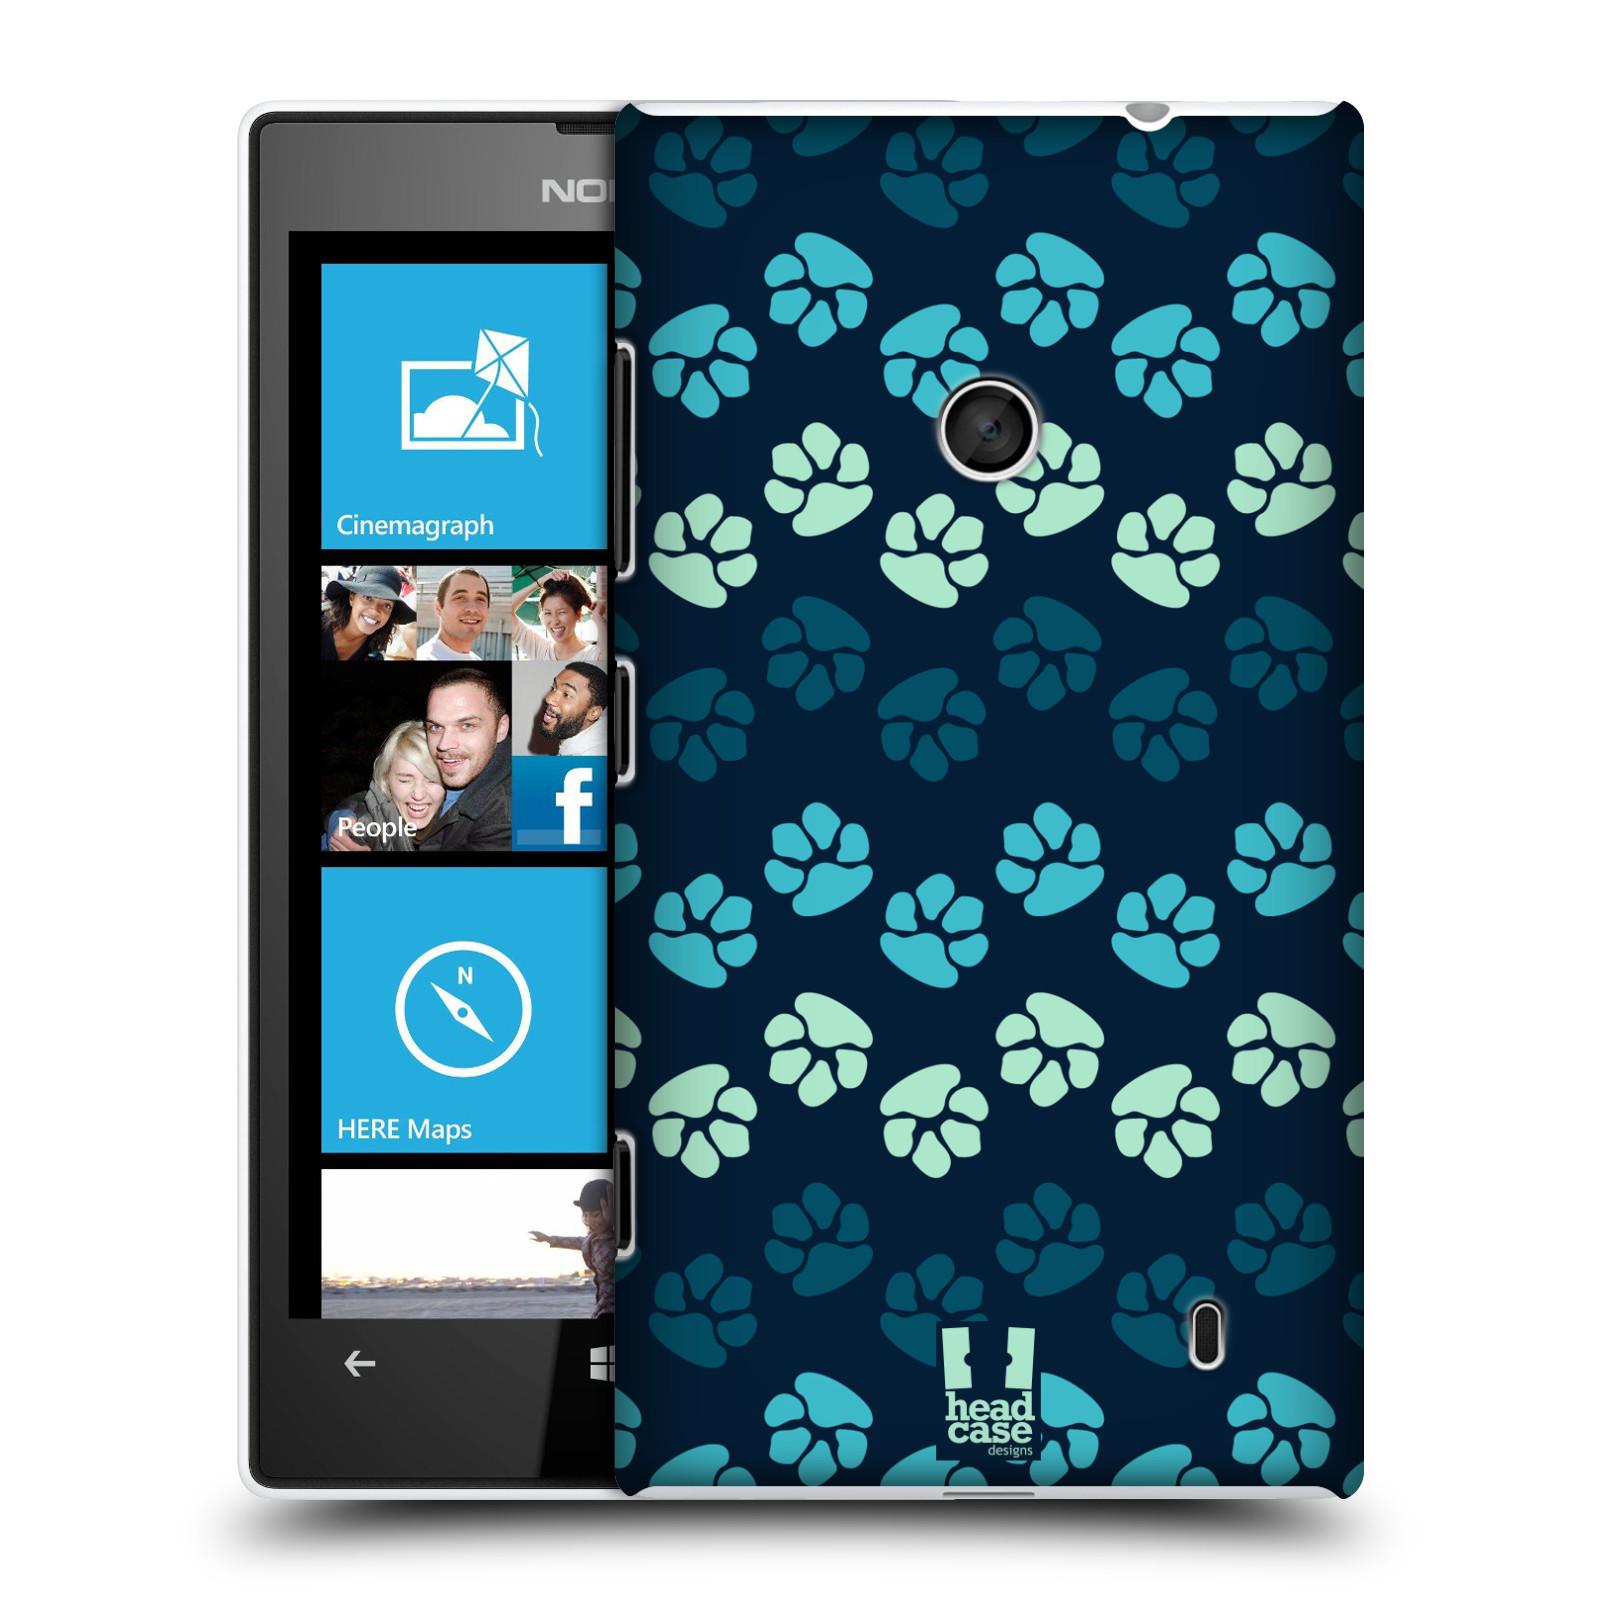 Plastové pouzdro na mobil Nokia Lumia 520 HEAD CASE TLAPKY MODRÉ (Kryt či obal na mobilní telefon Nokia Lumia 520 )